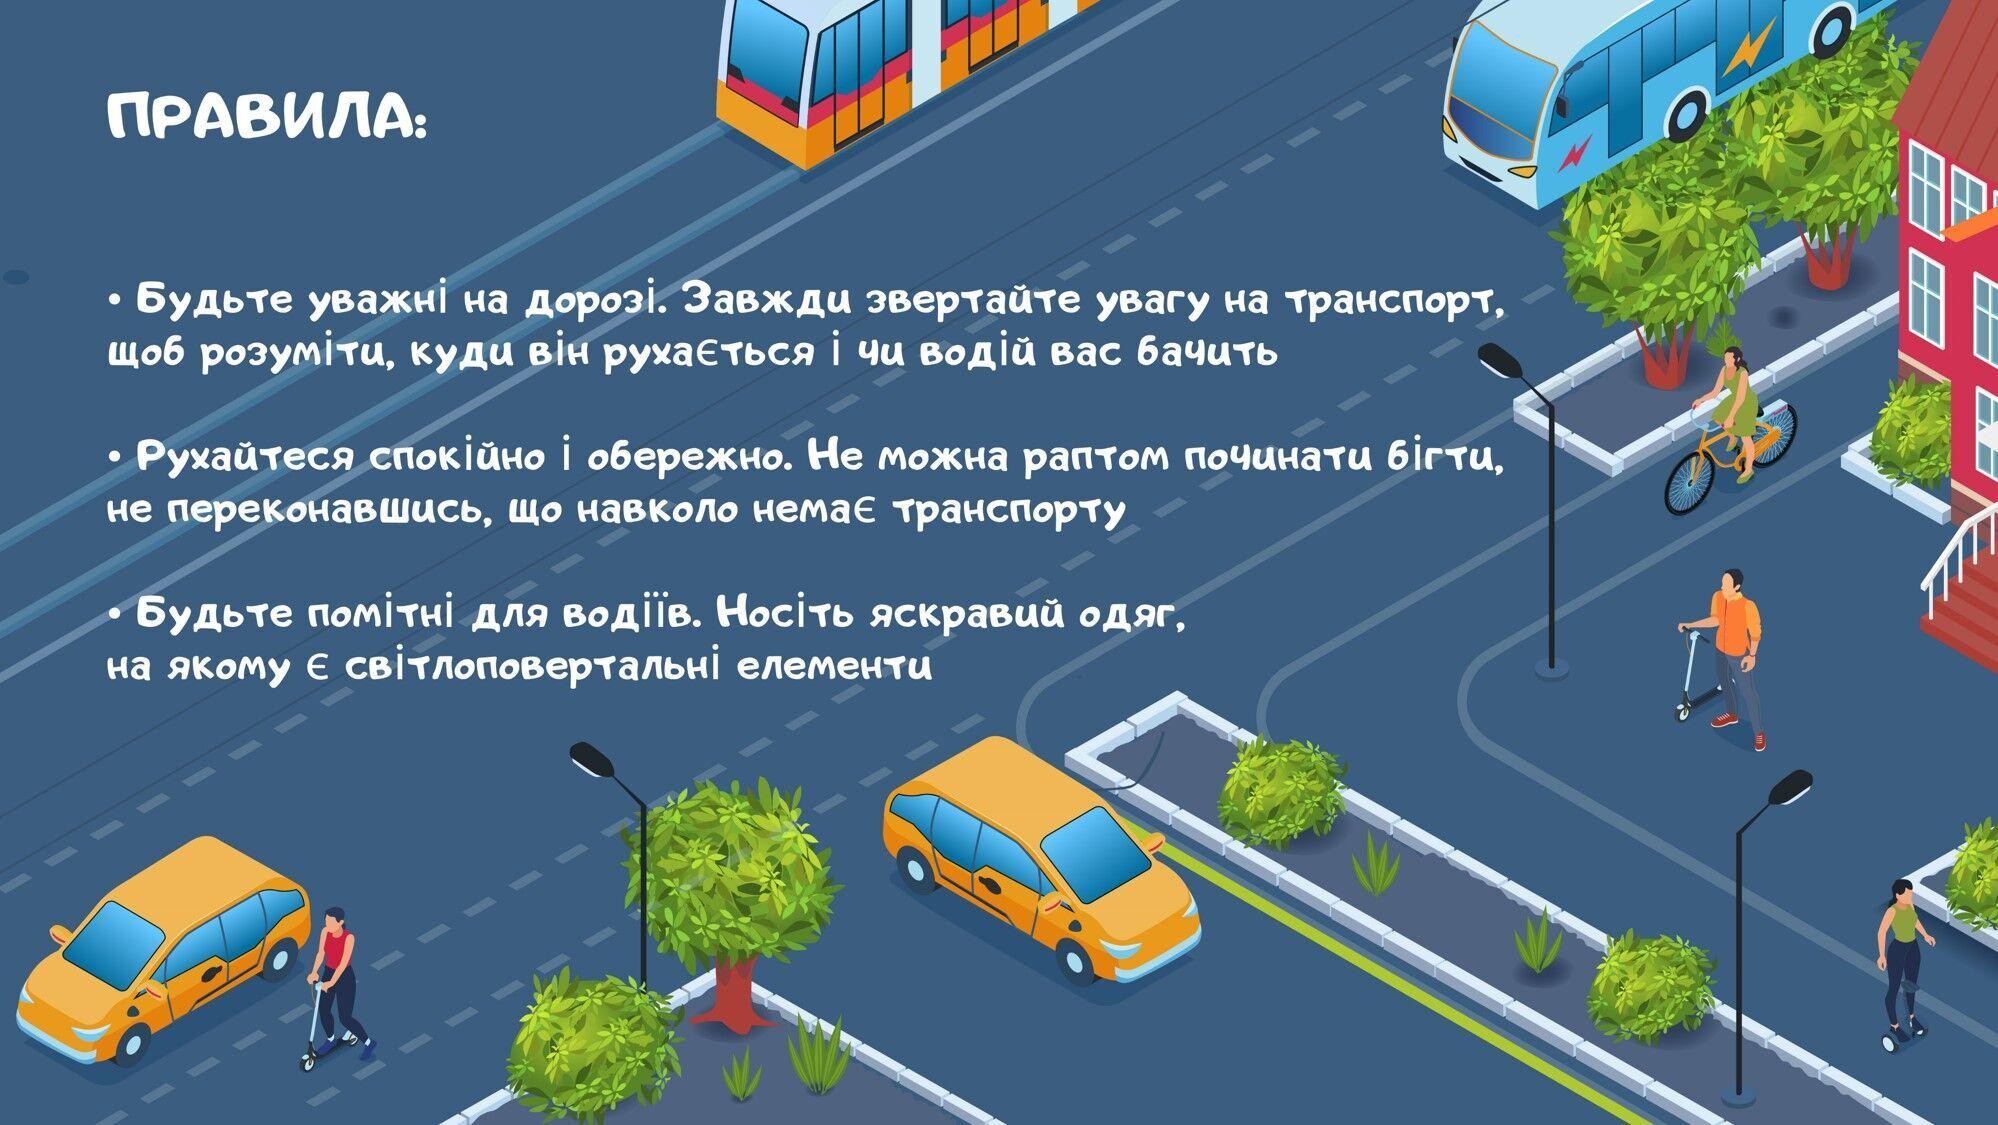 Презентация МВД.